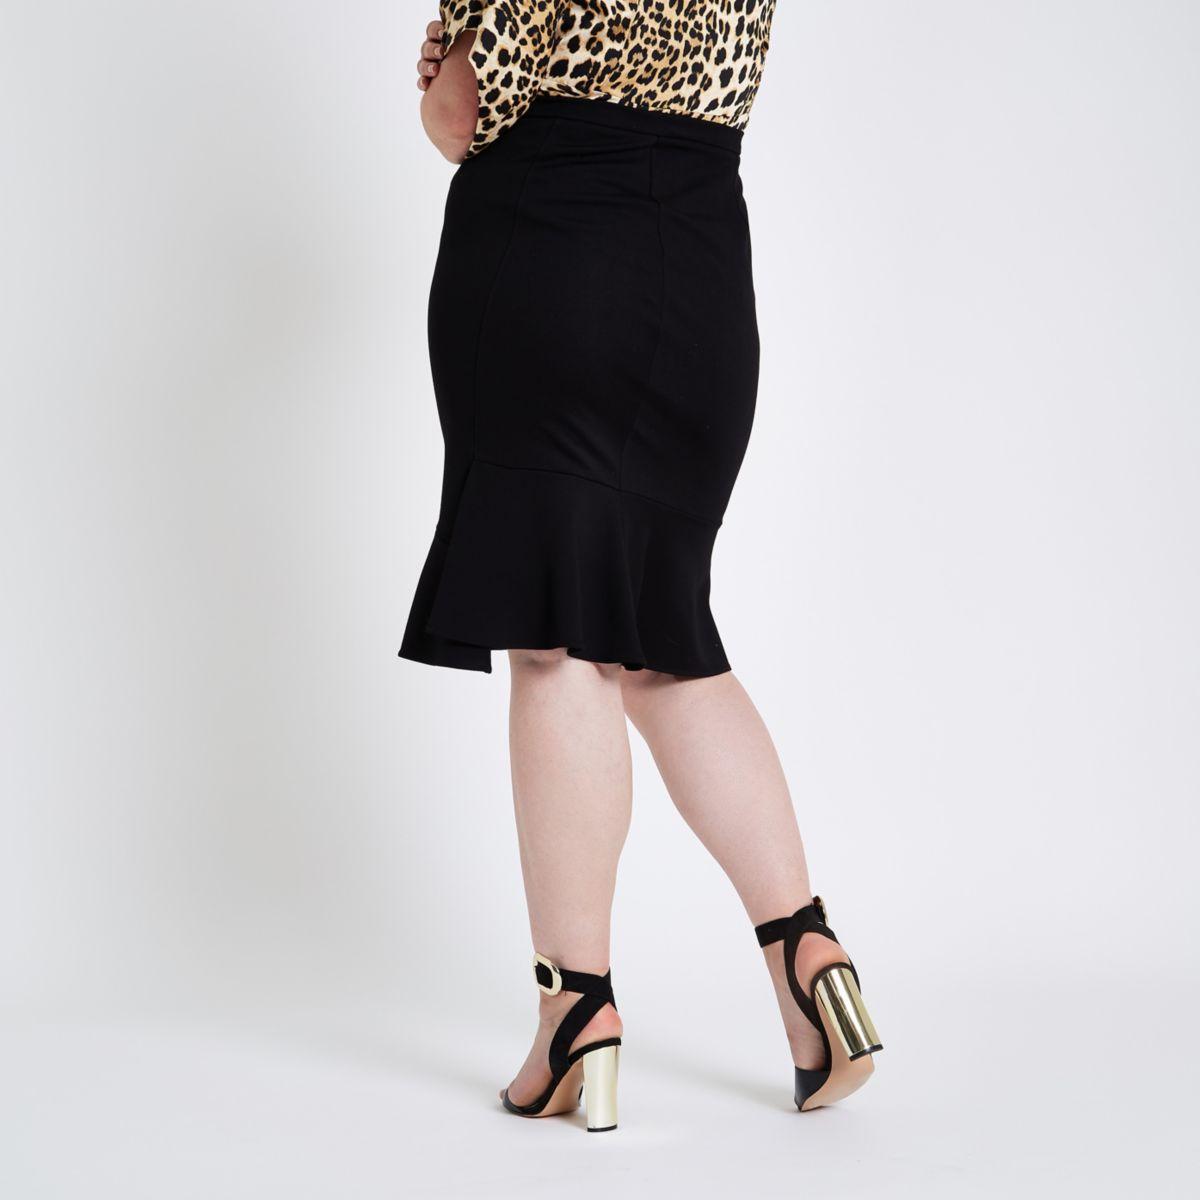 frill Plus black pencil skirt ponte PPXawE